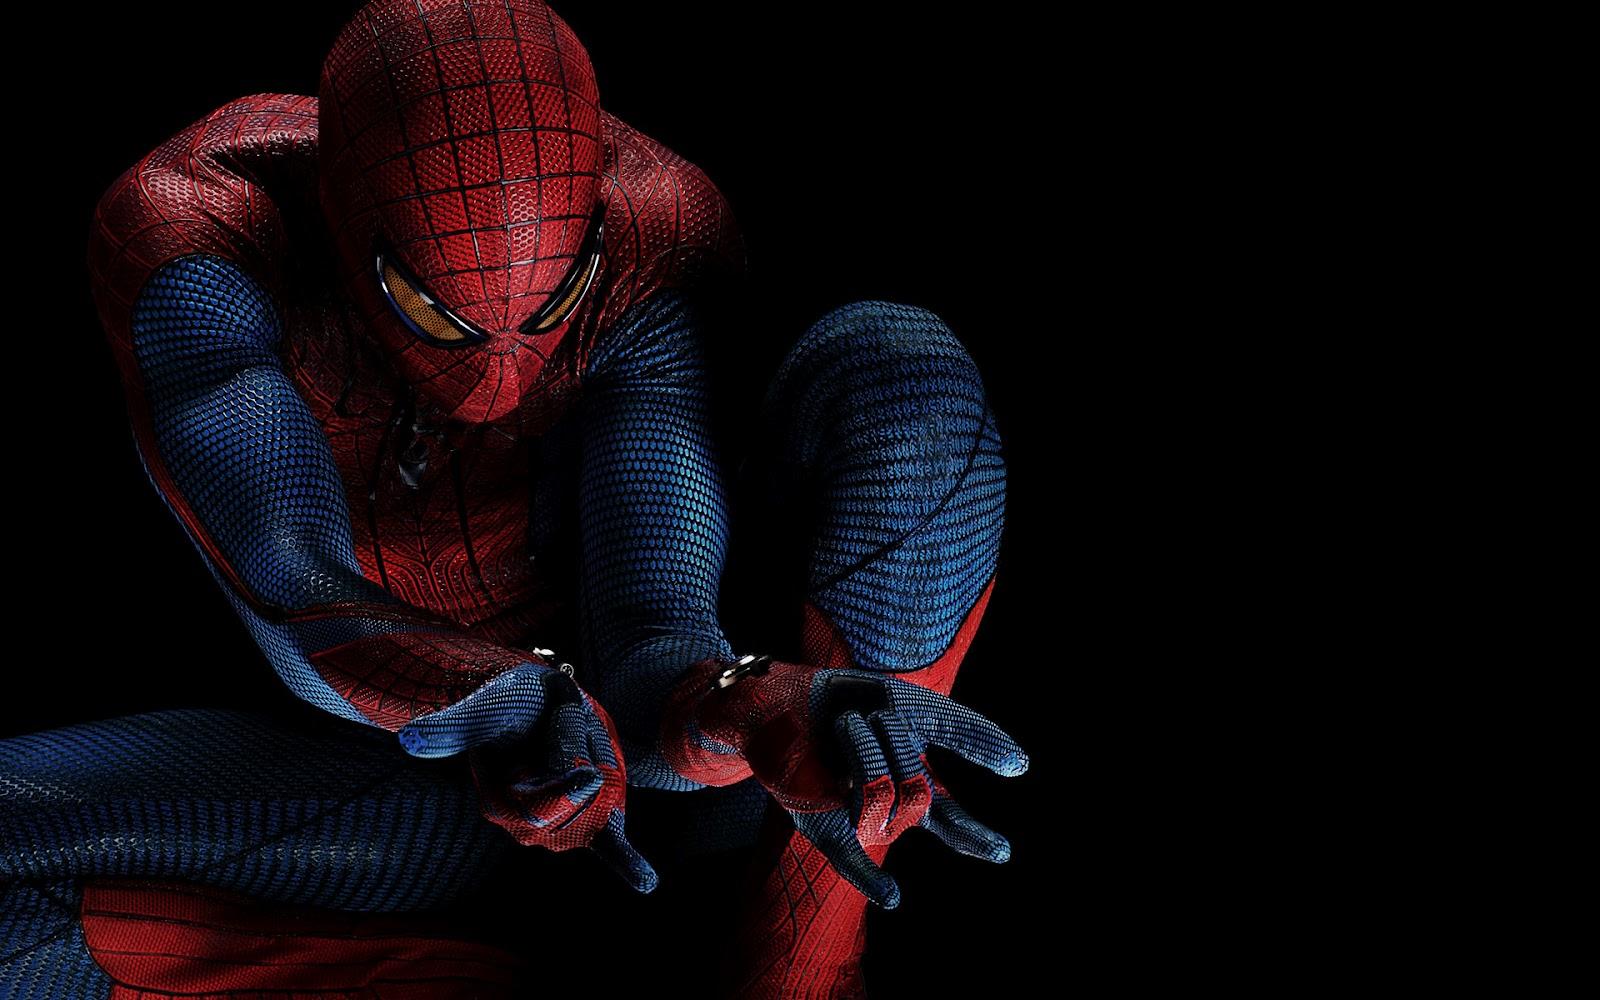 spider man wallpapers hd fondos 2jpg 1600x1000